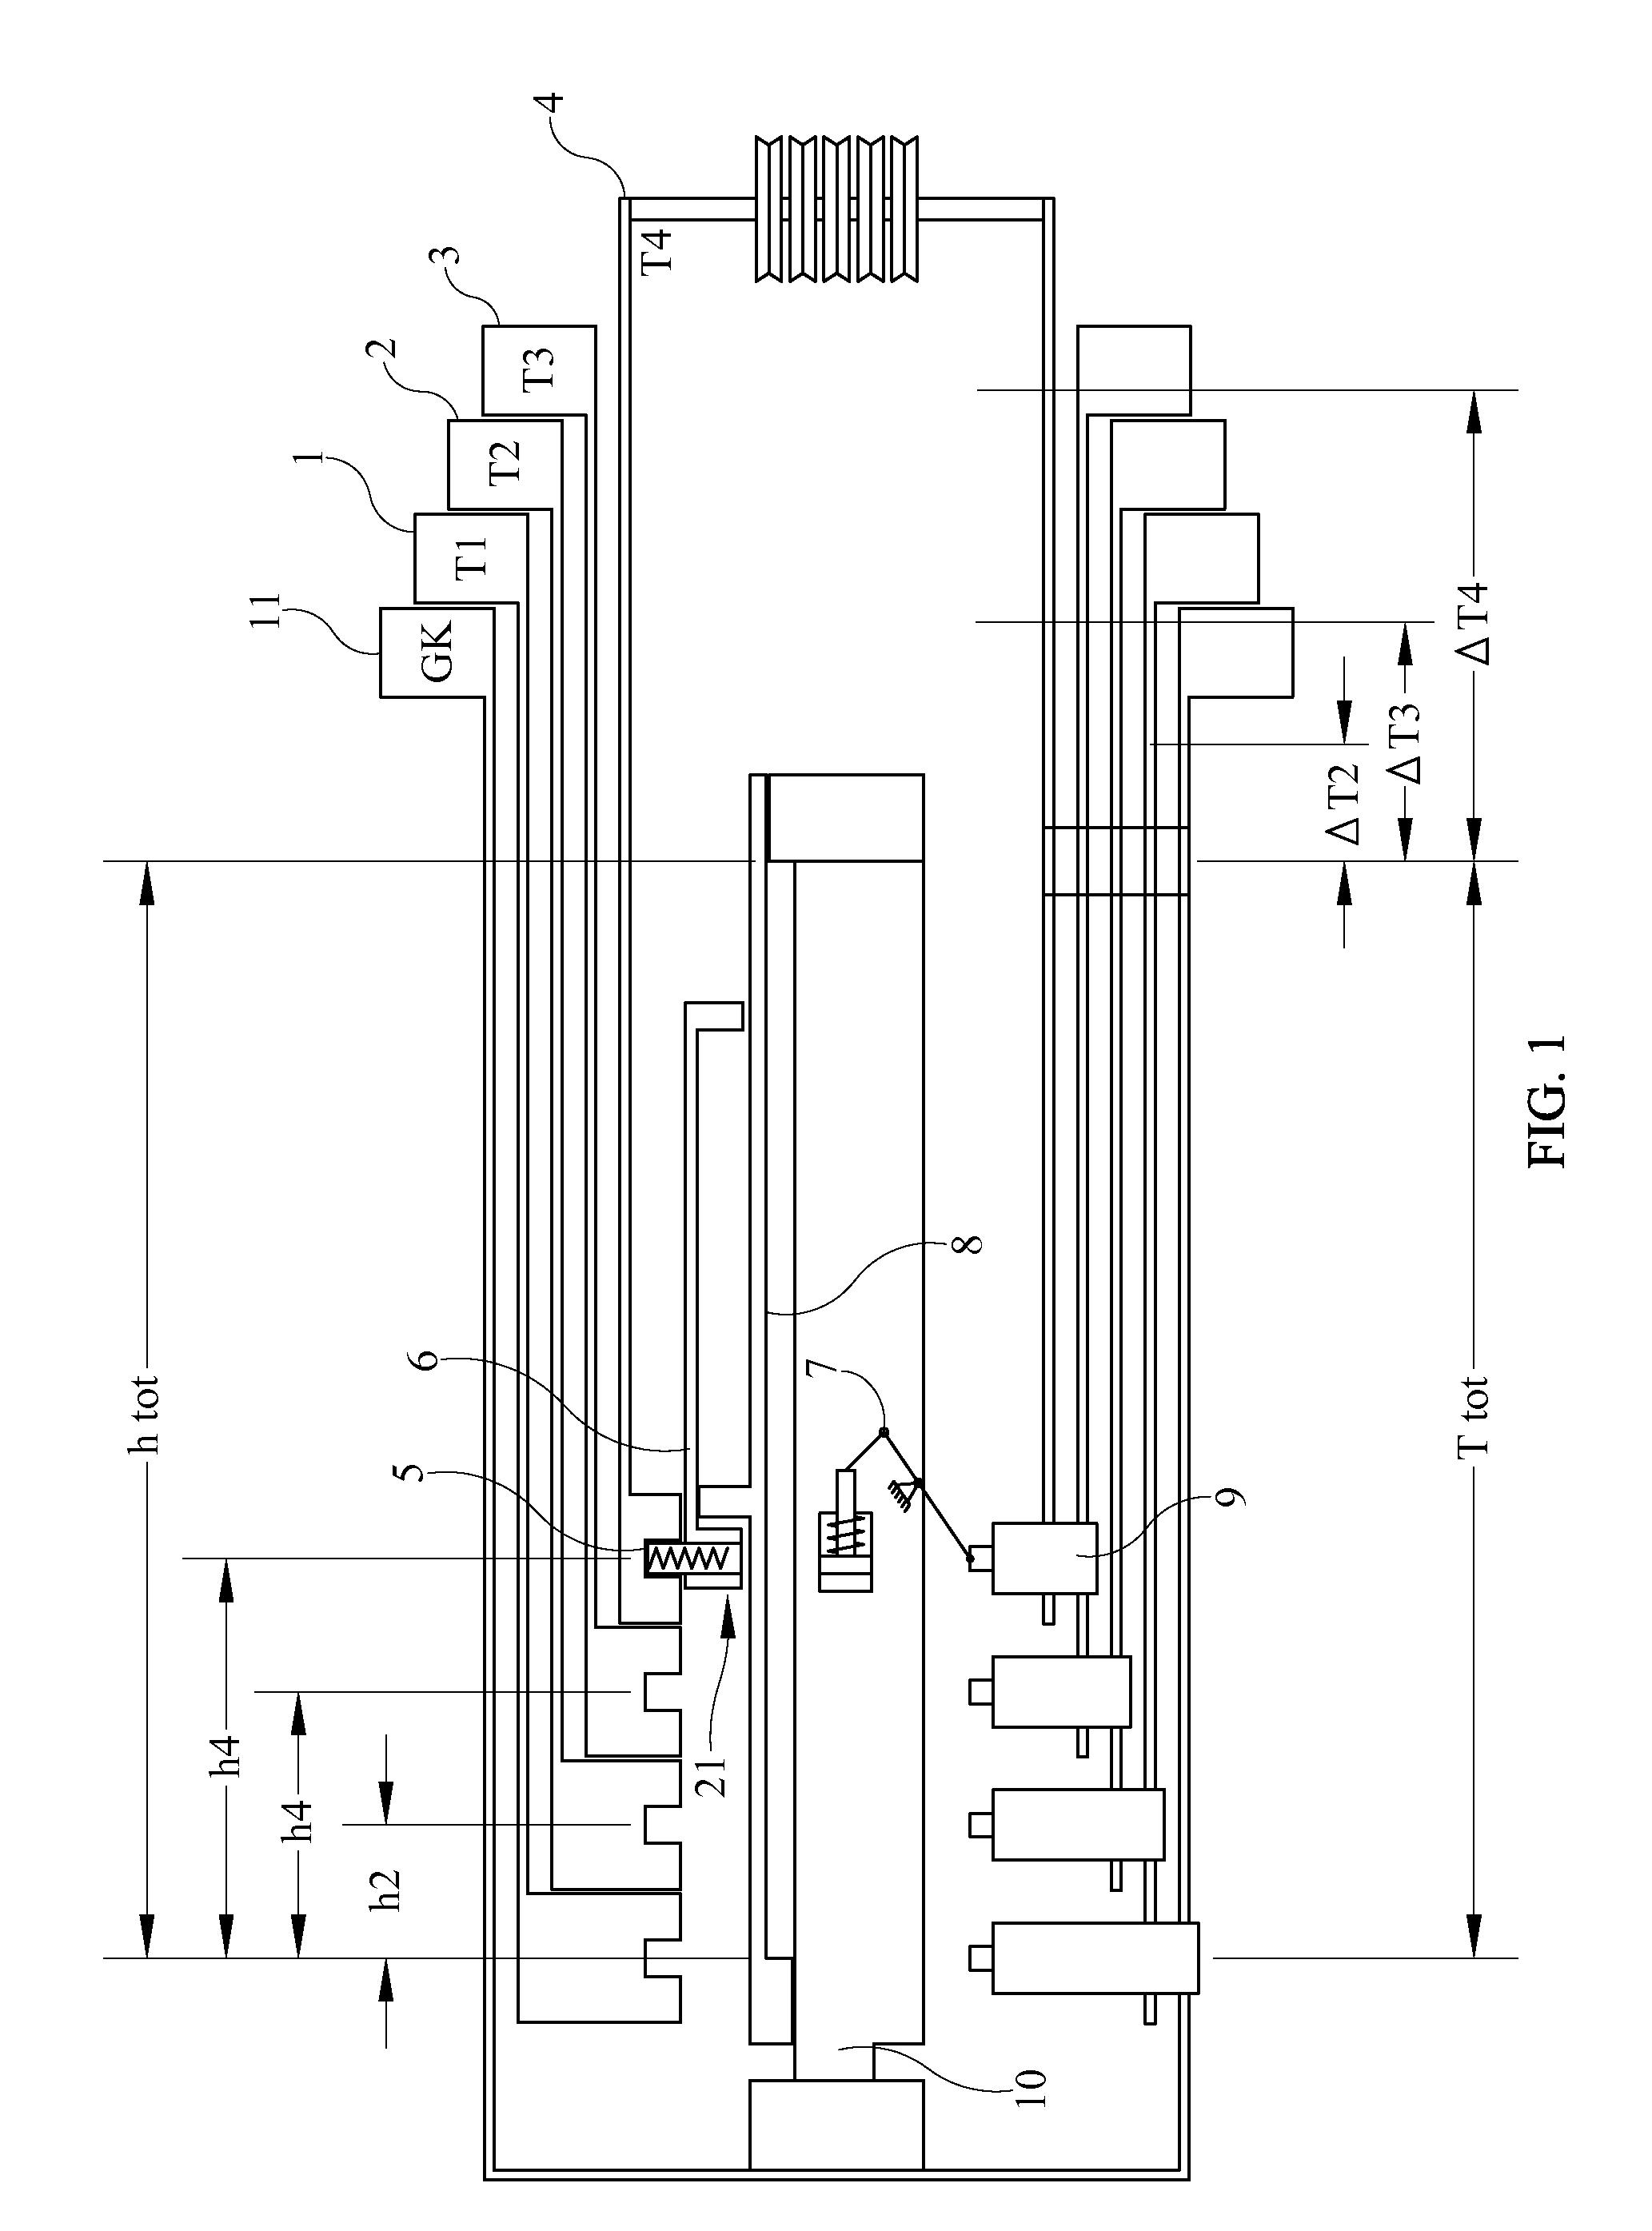 Telescopic Crane Components : Patent us  locking system for telescopic crane